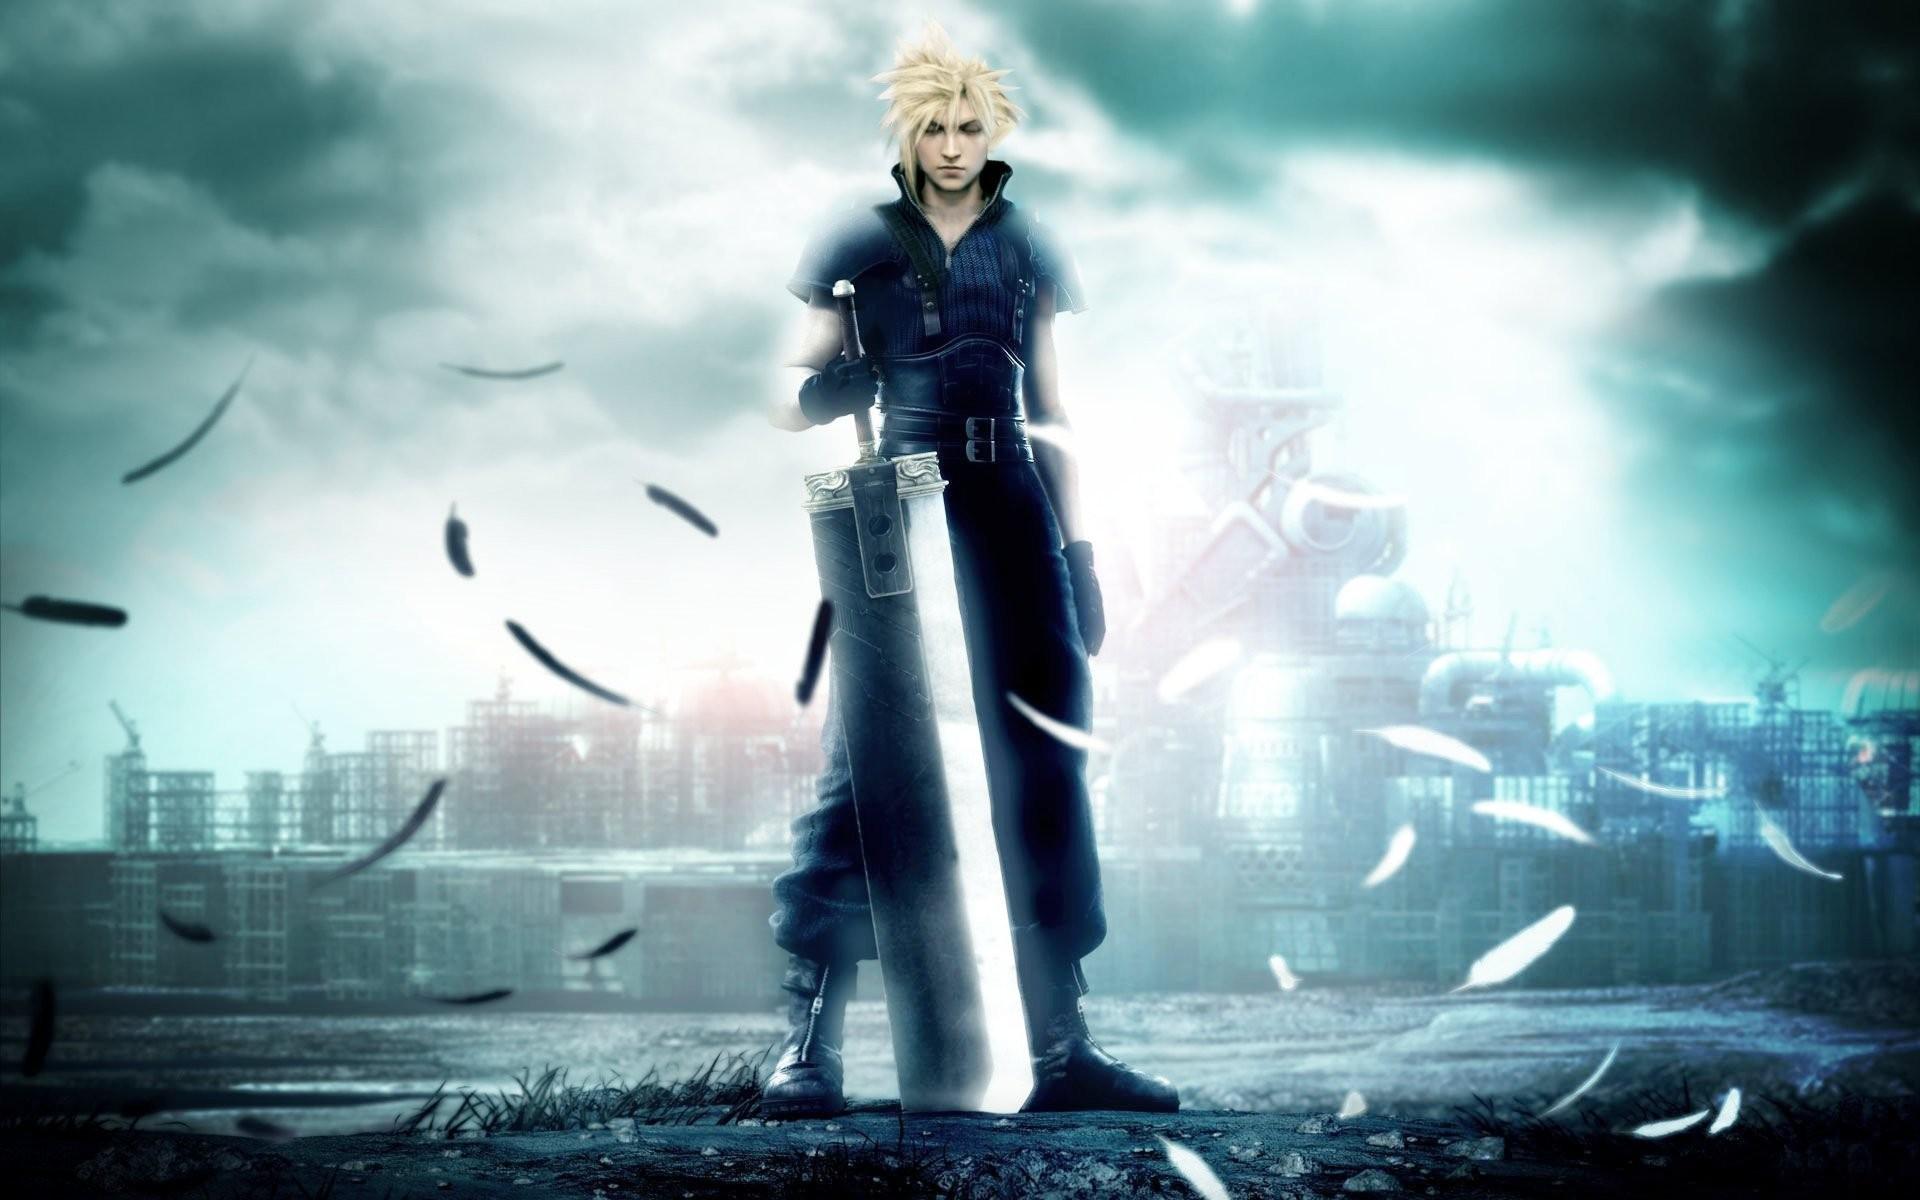 Final Fantasy Vii Wallpapers Wallpapertag